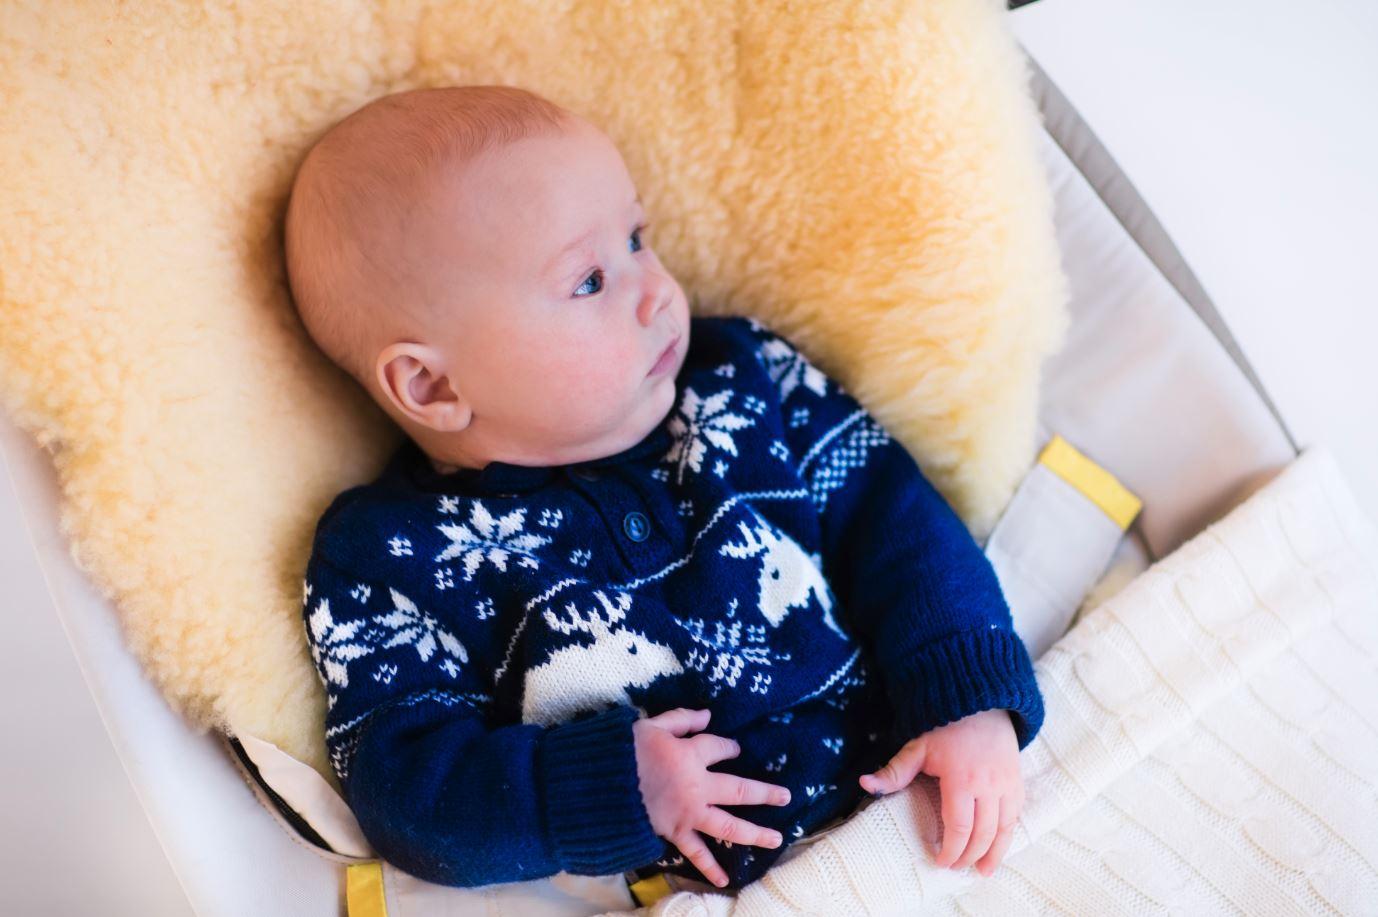 Baby liegt auf Lammfell